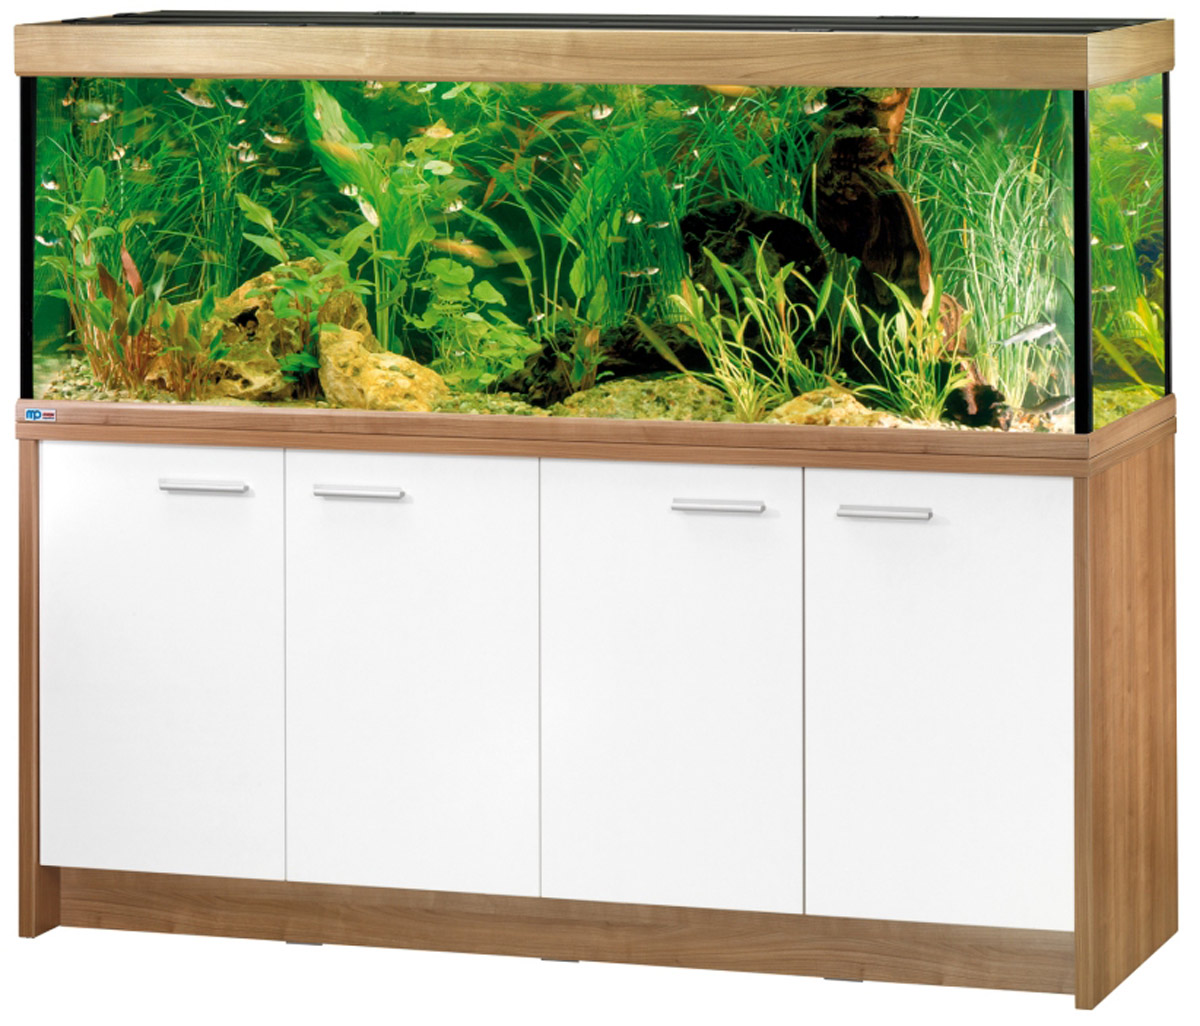 eheim scubaline 640 aquarium kombination mit unterschrank. Black Bedroom Furniture Sets. Home Design Ideas